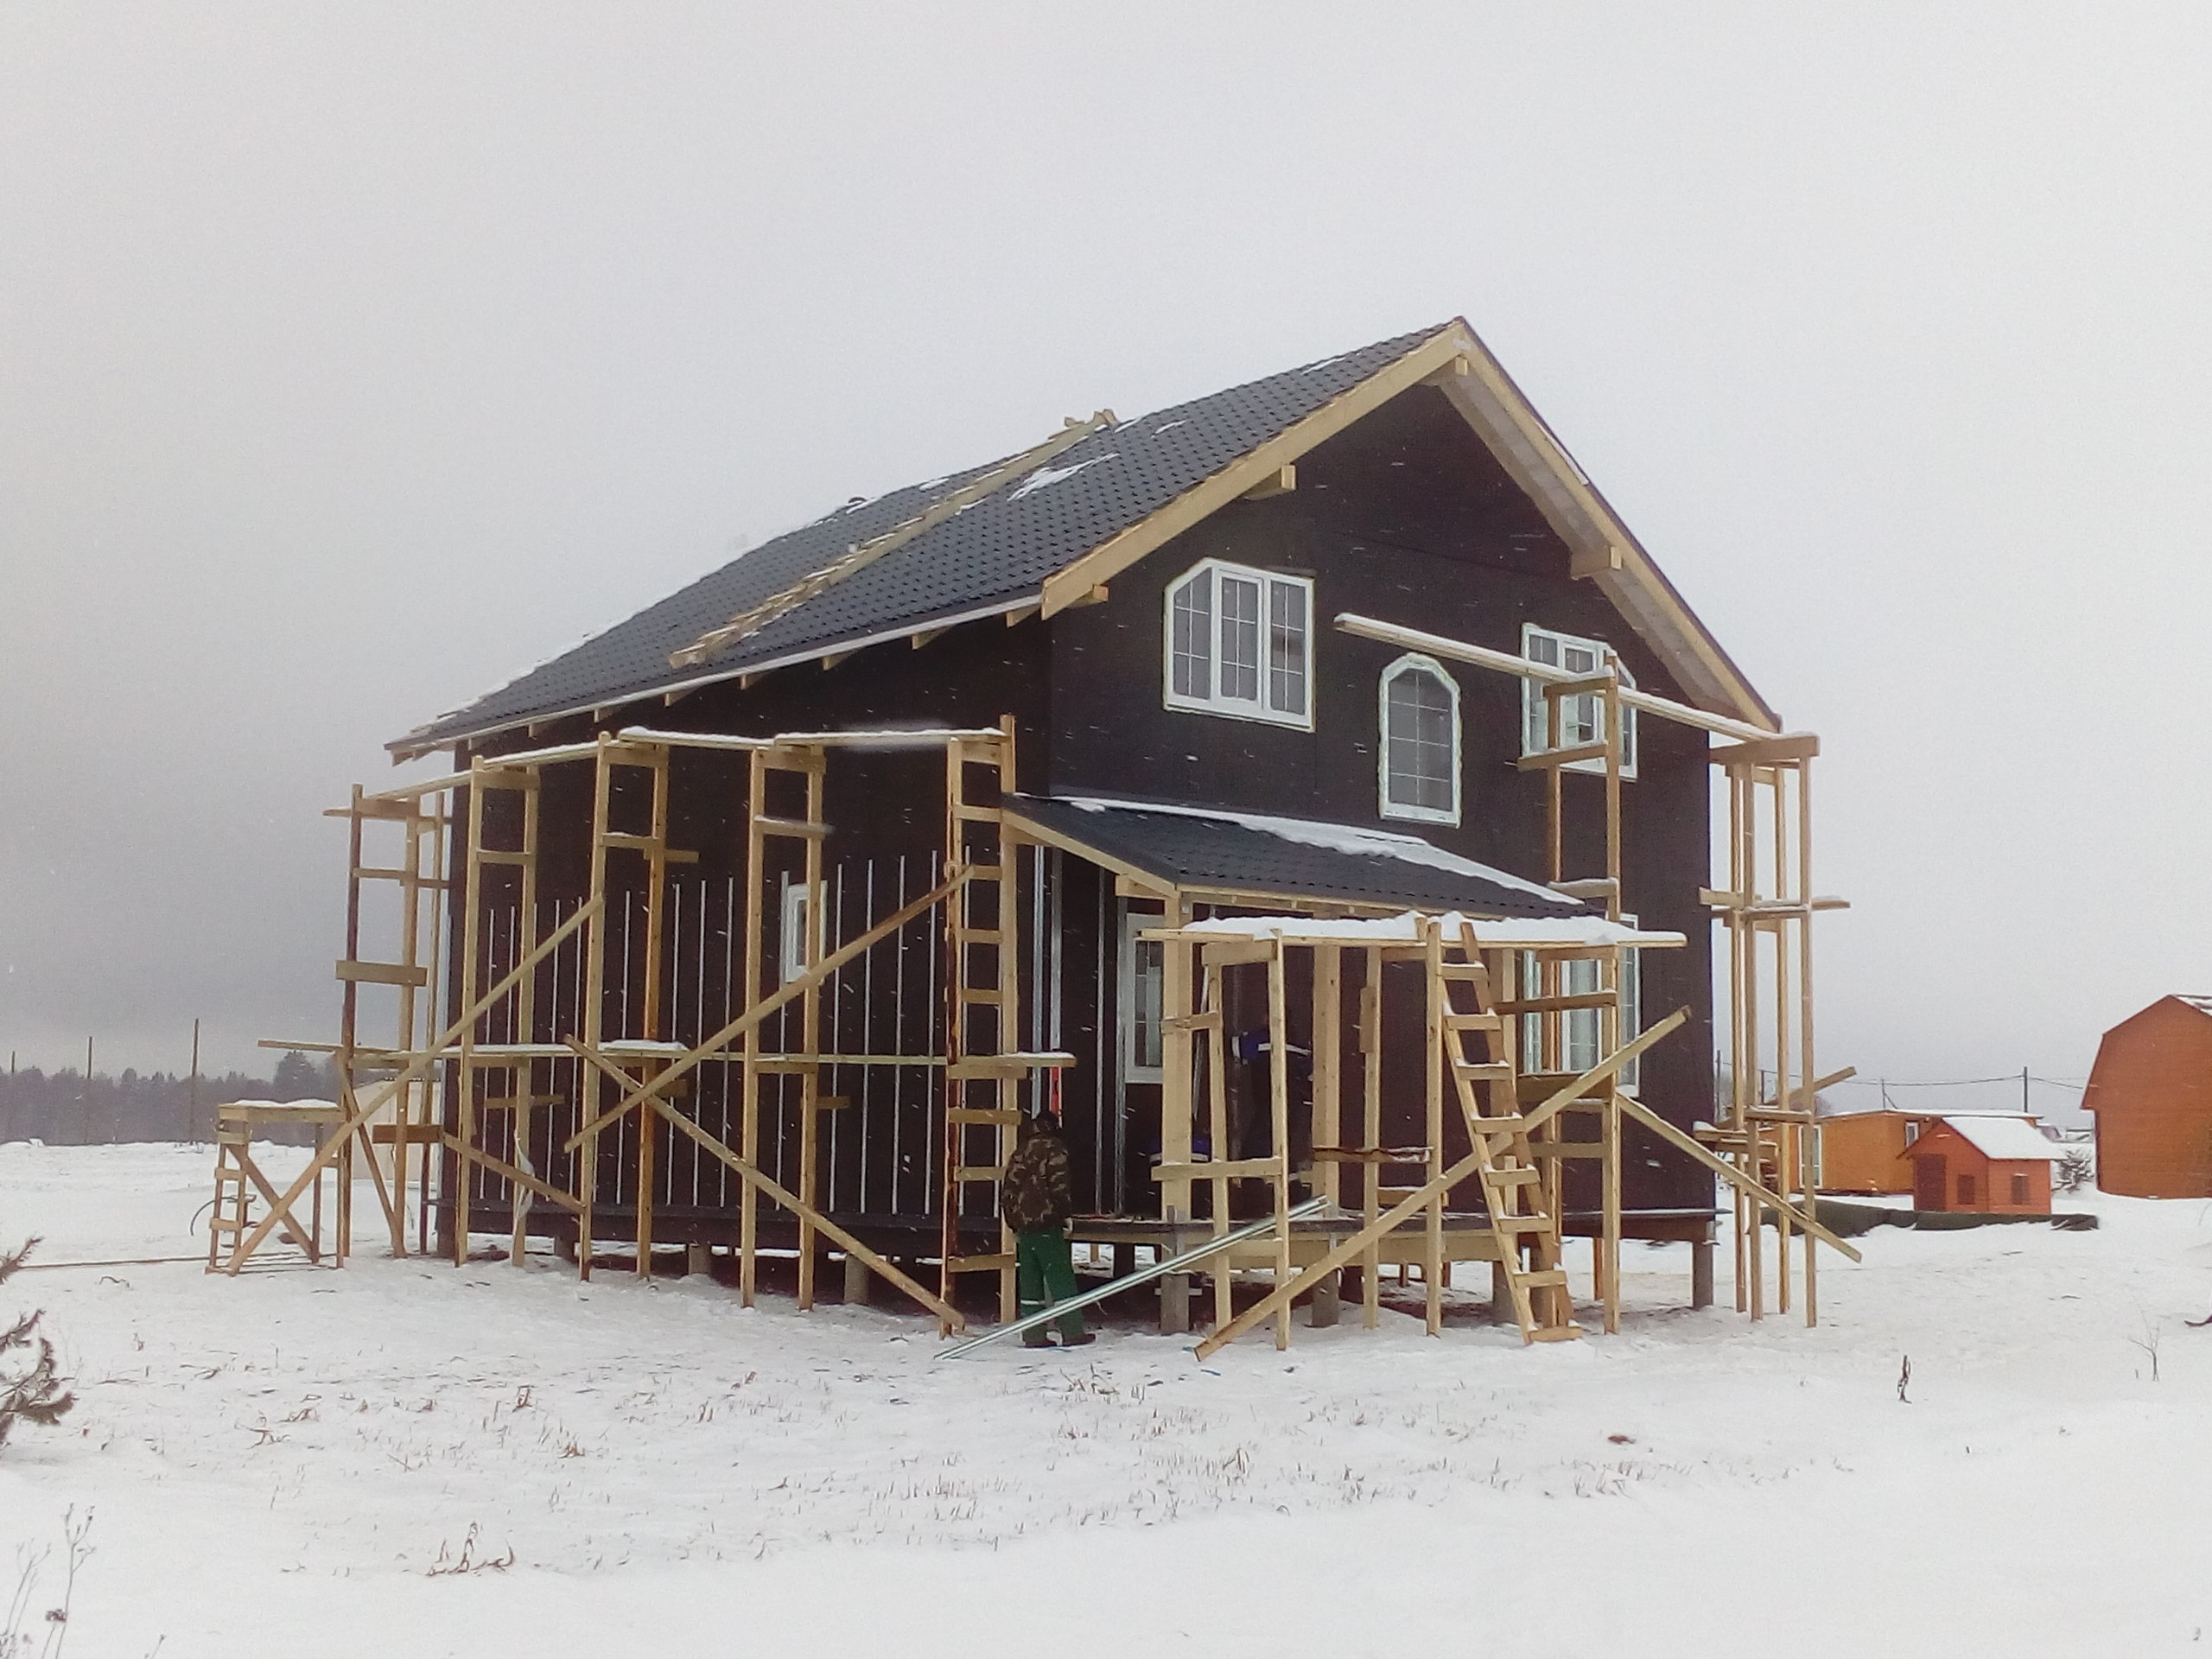 фото дома из сип панелей №9 сокули